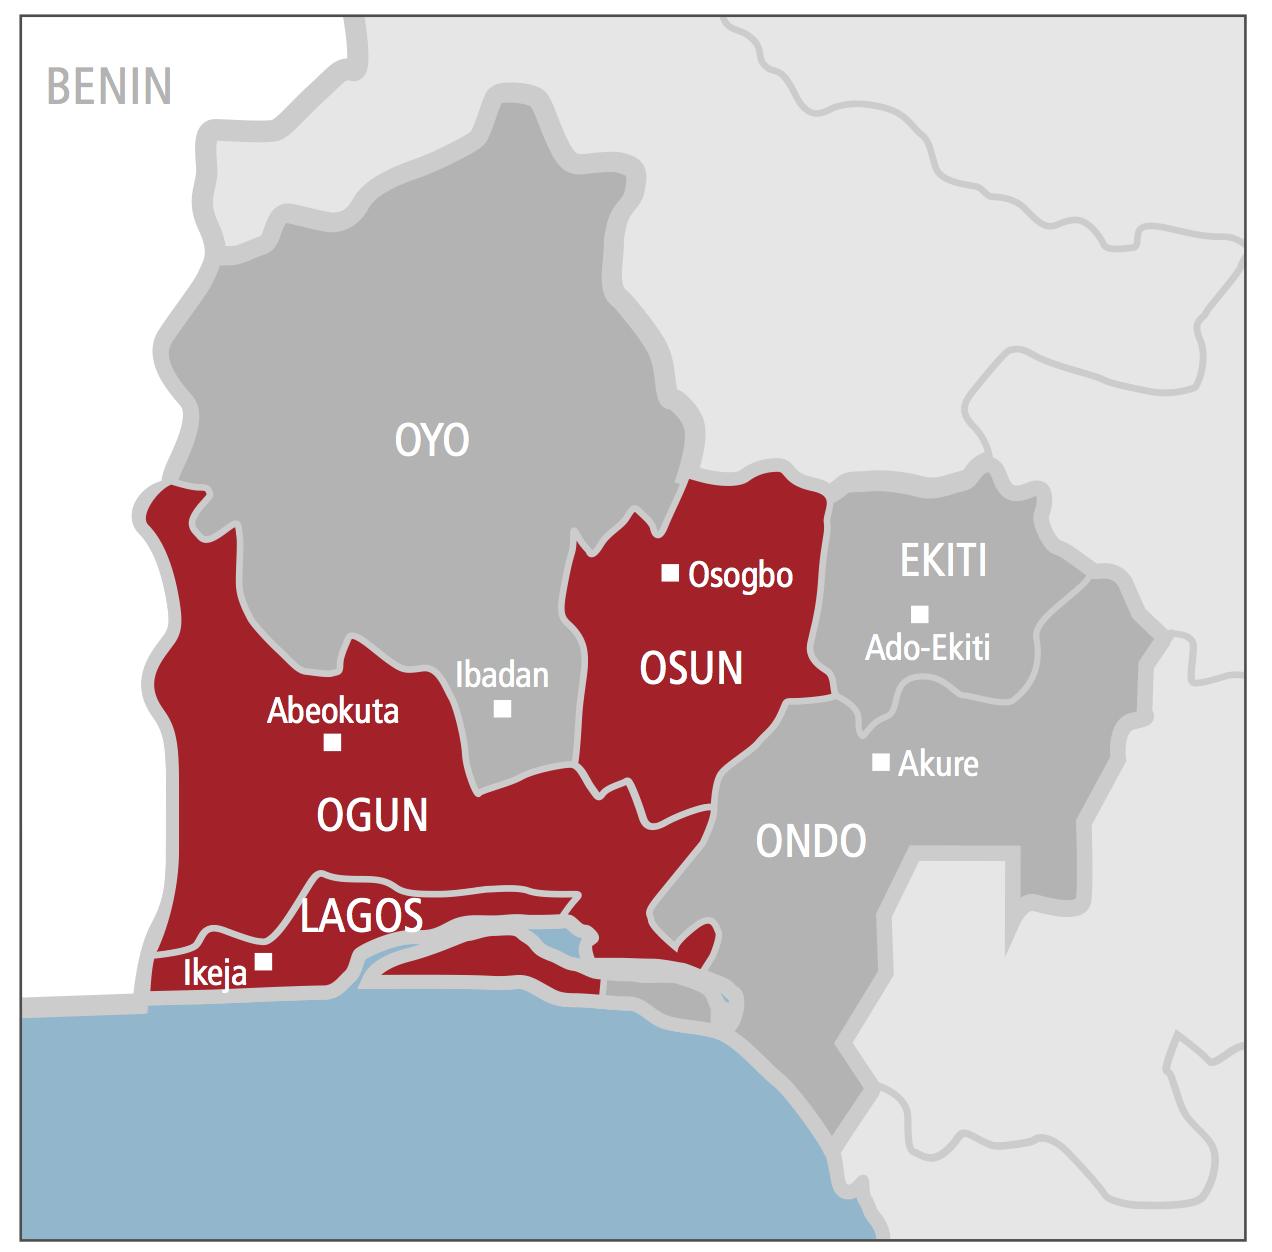 Dating site in nigeria ibadan map